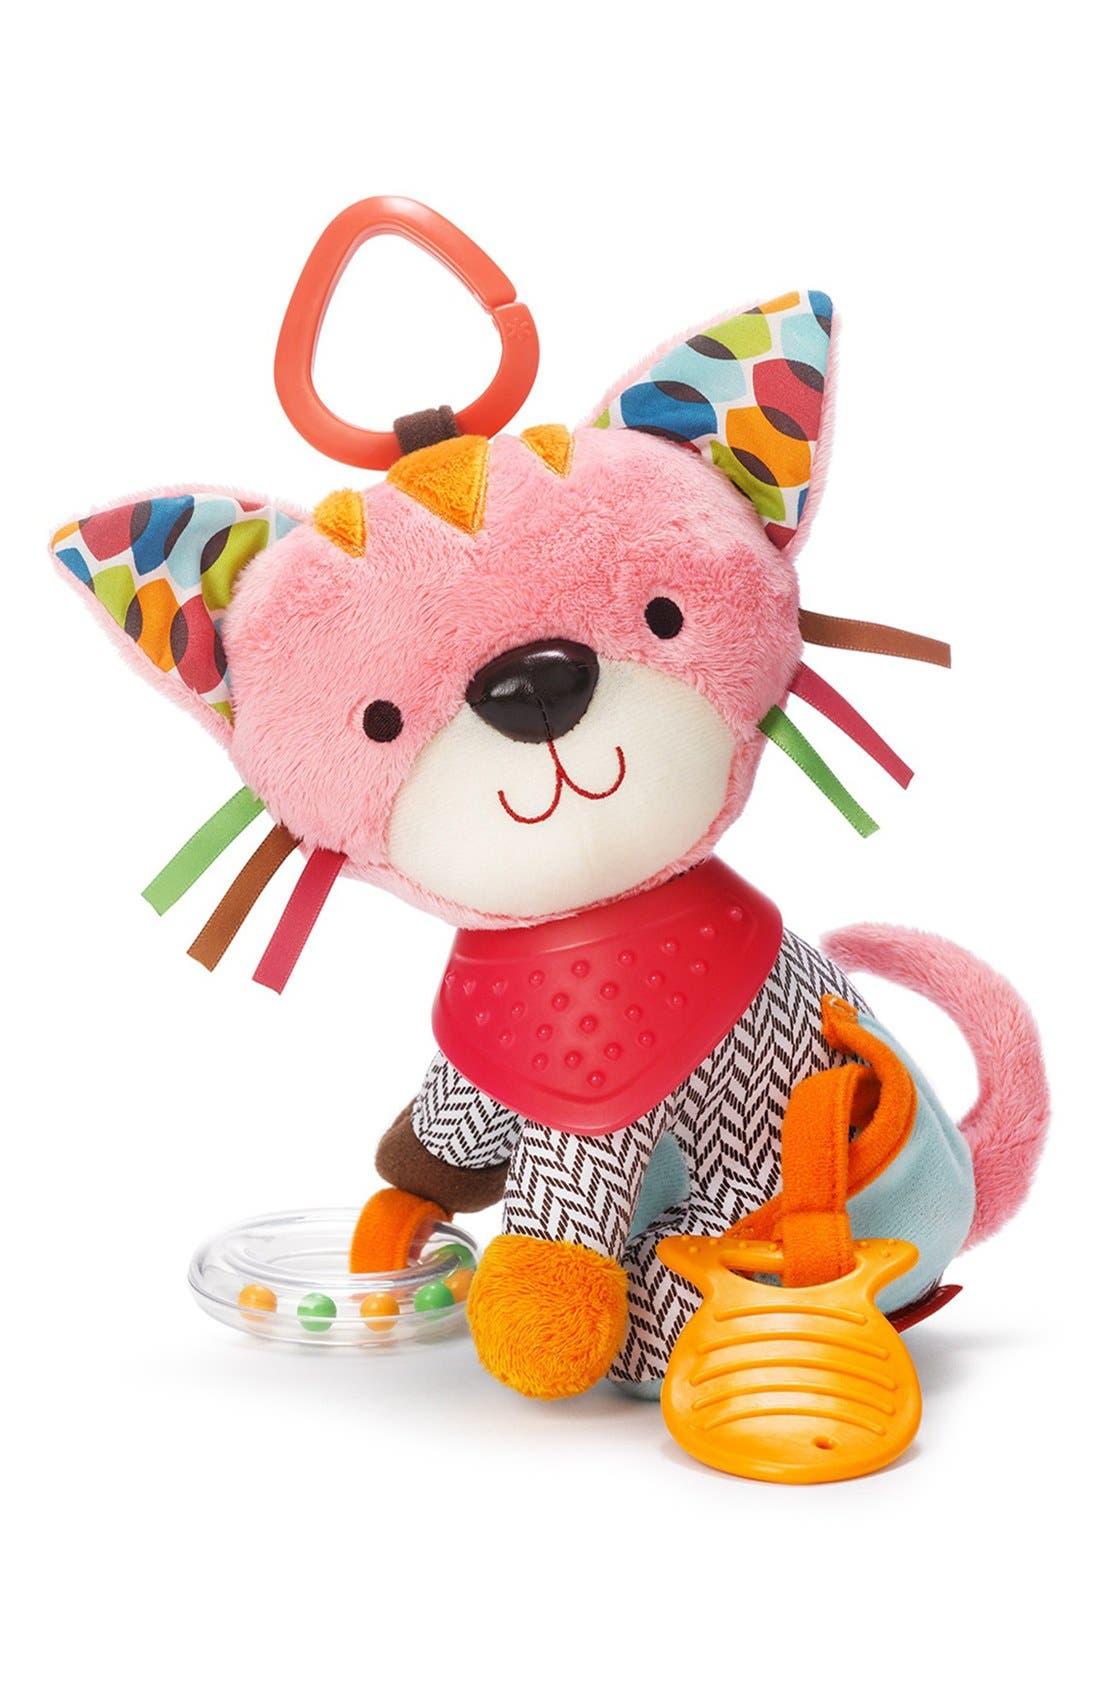 Skip Hop 'Bandana Buddies' Activity Kitten